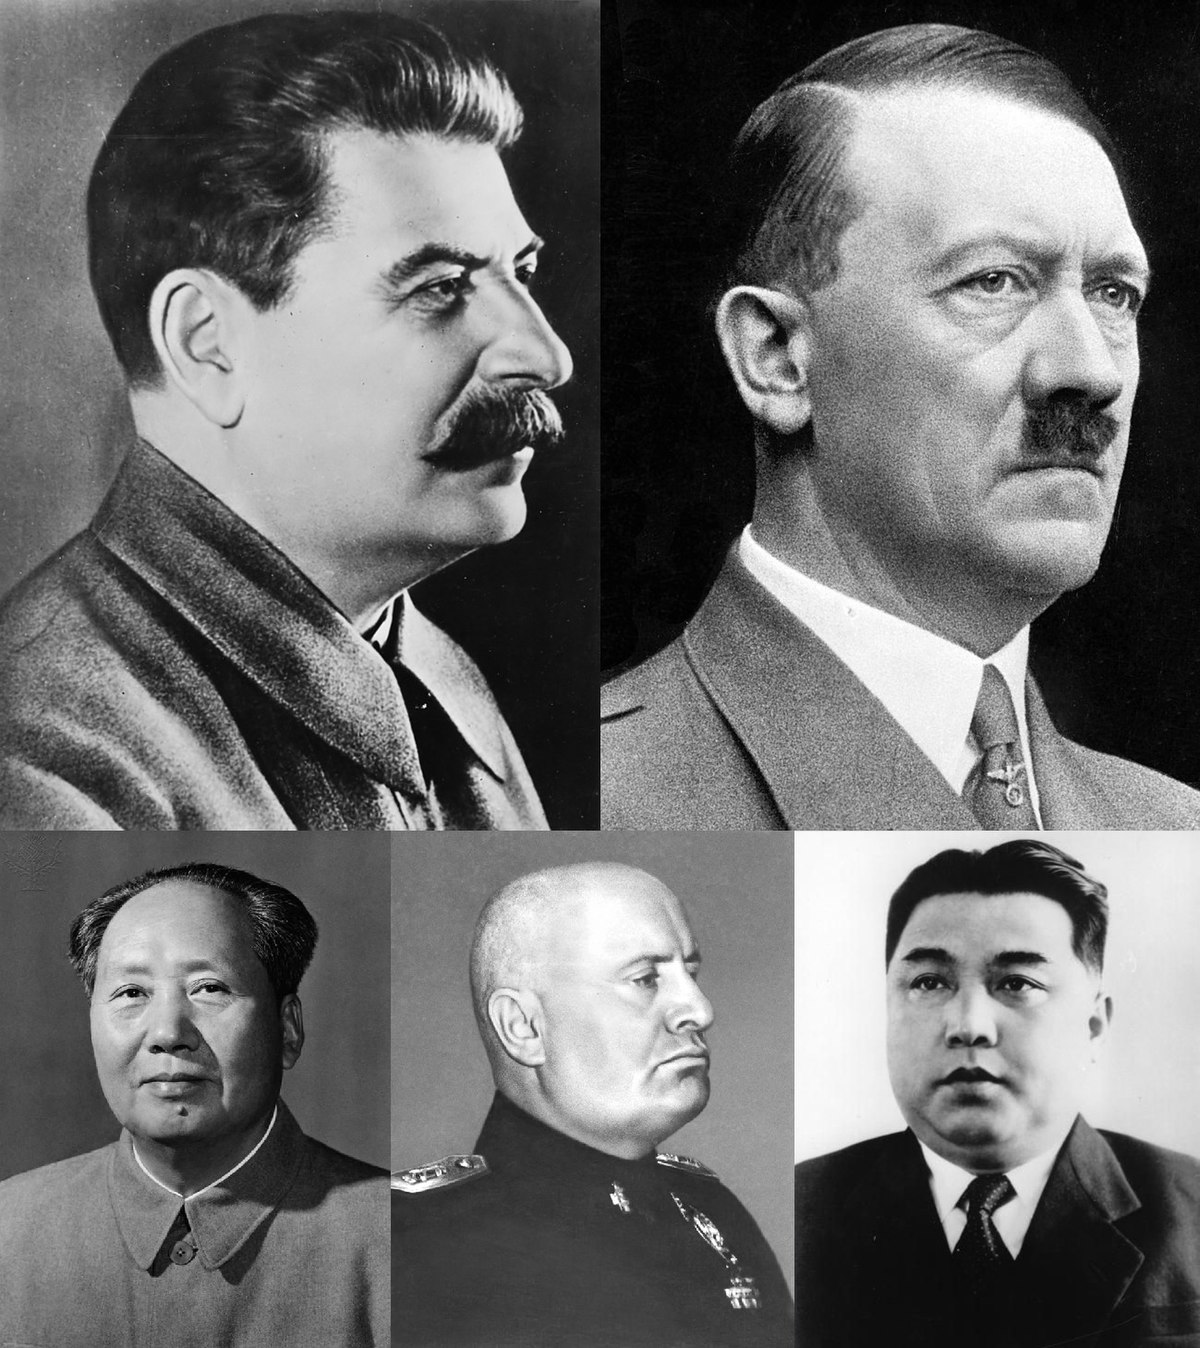 Totalitarismo - Wikipedia, la enciclopedia libre